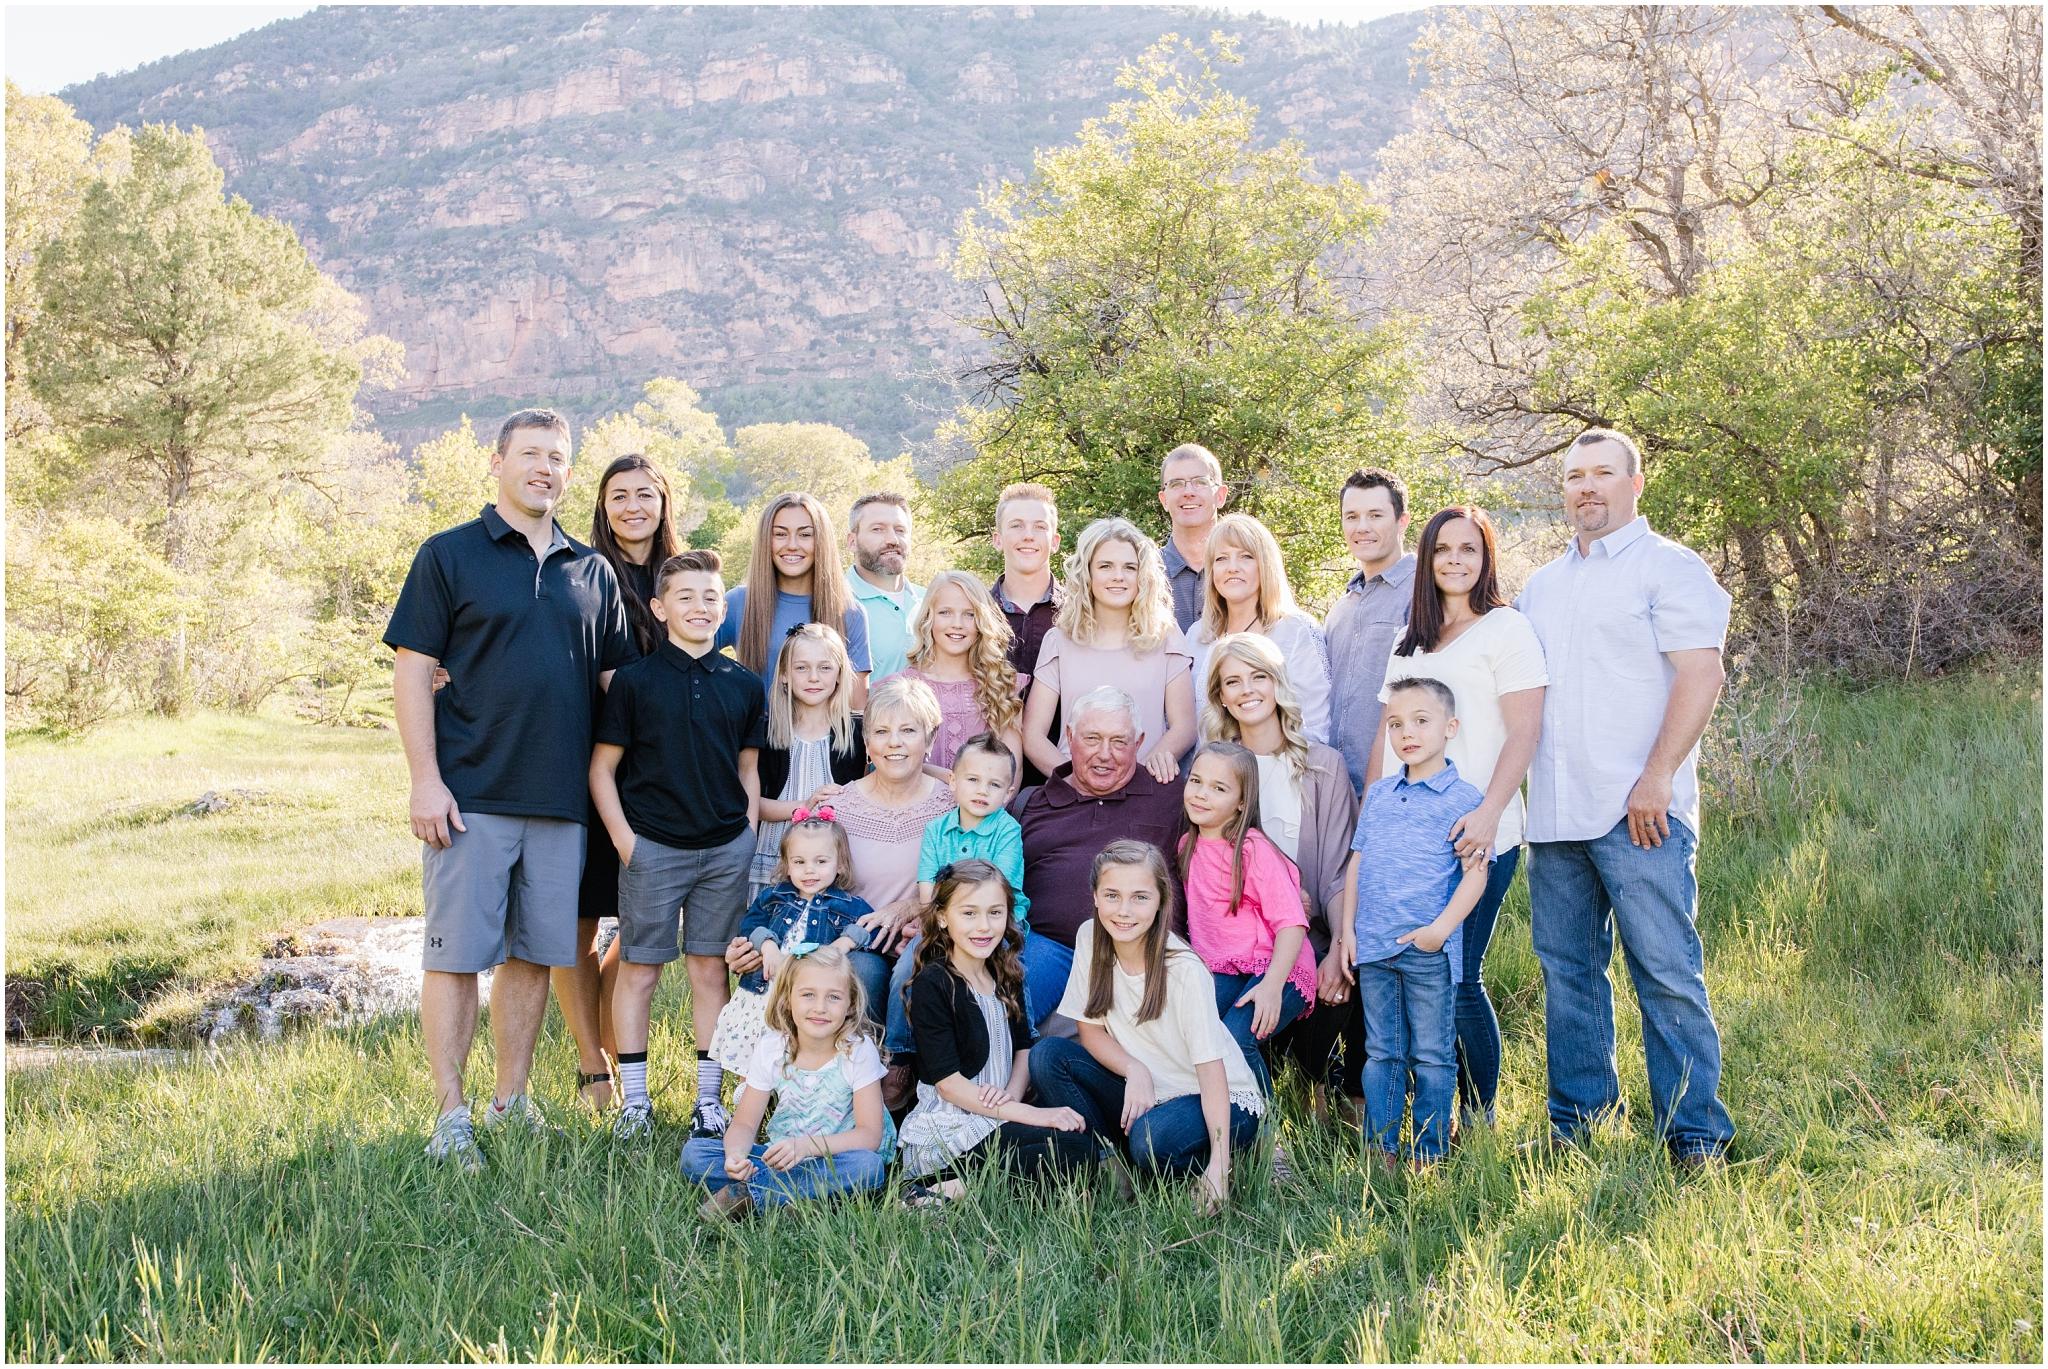 Bagley-16_Lizzie-B-Imagery-Utah-Family-Photographer-Central-Utah-Photographer-Utah-County-Extended-Family.jpg